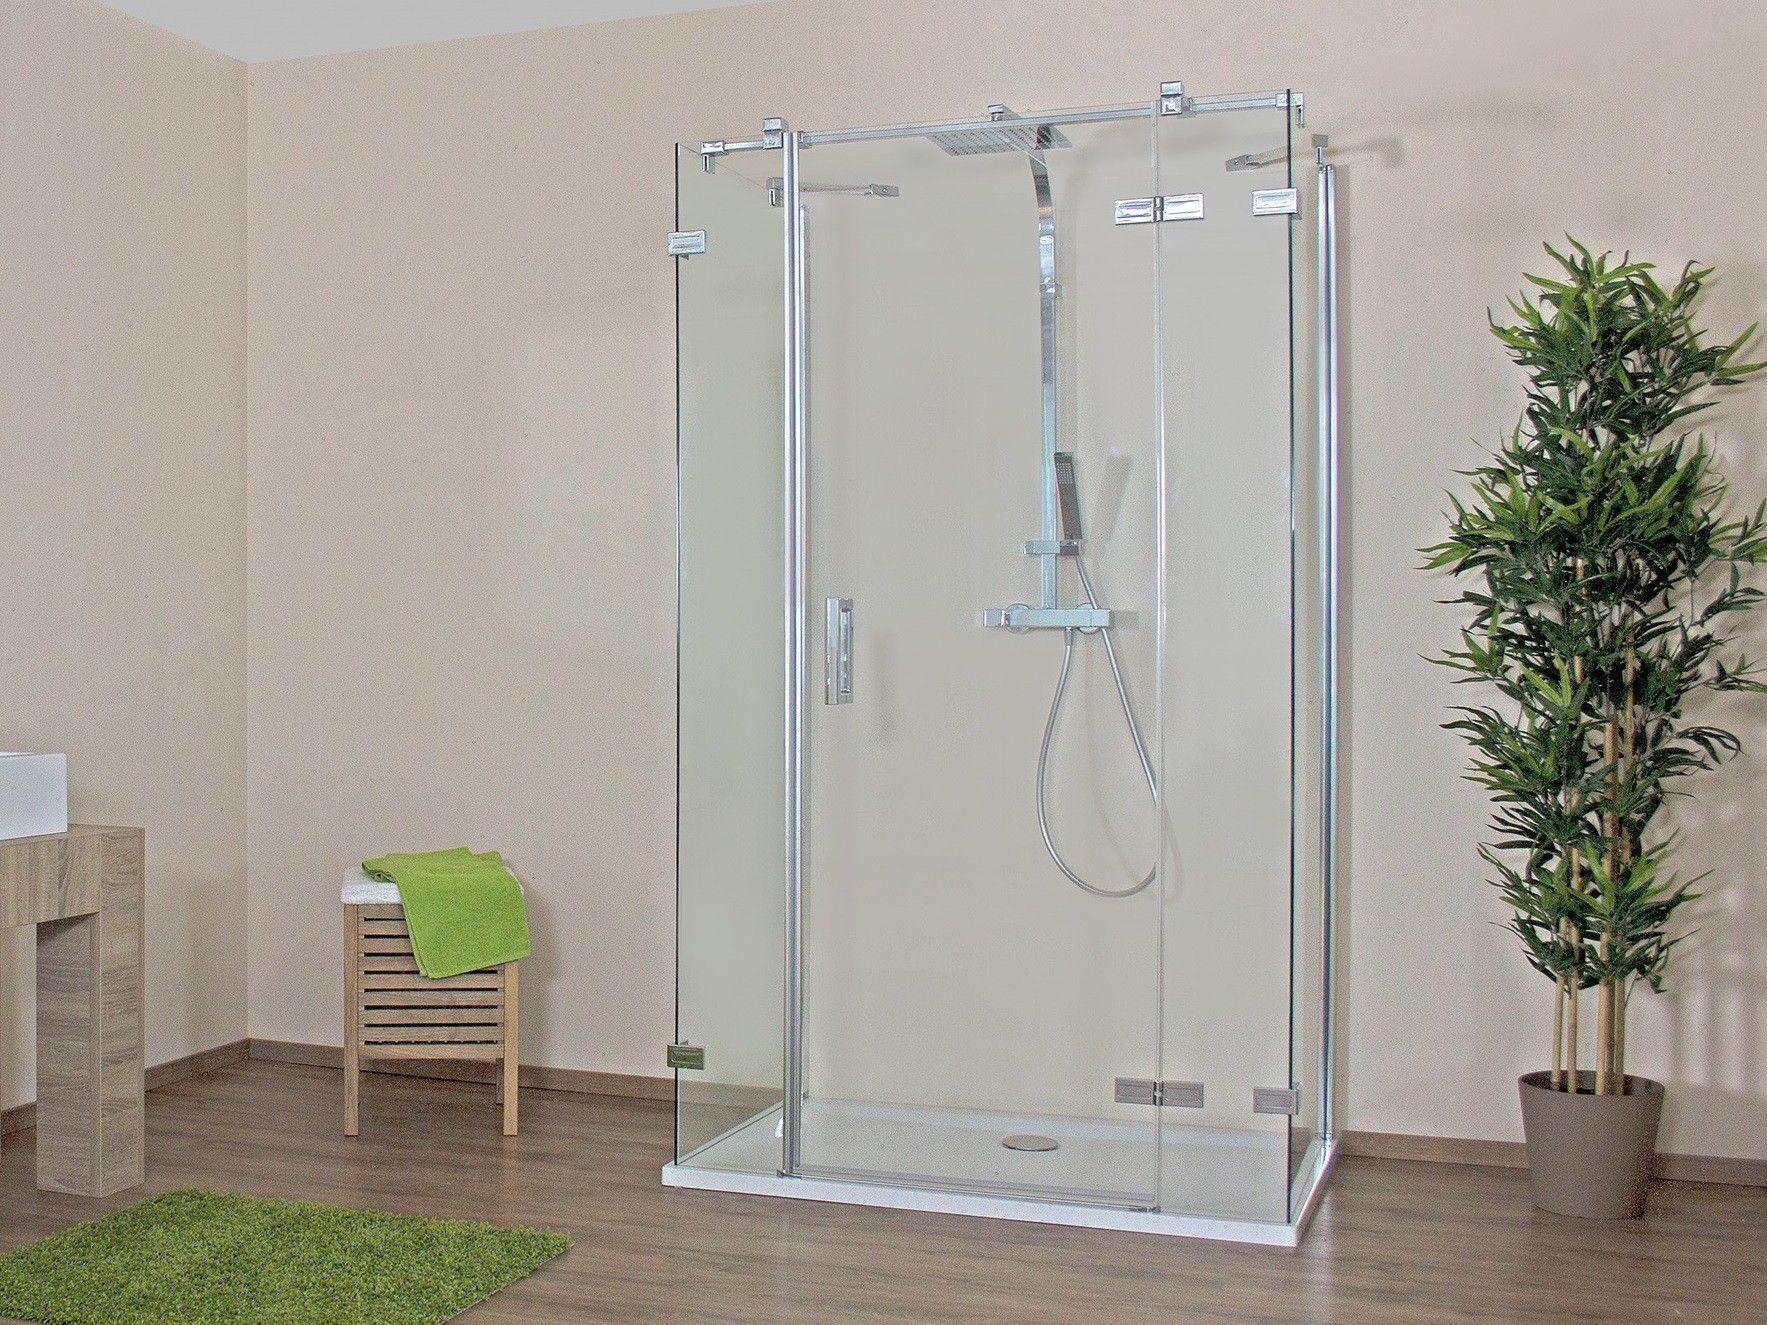 Dusche U Kabine Bad Design Heizung Duschkabine U Form Duschkabine Dusche